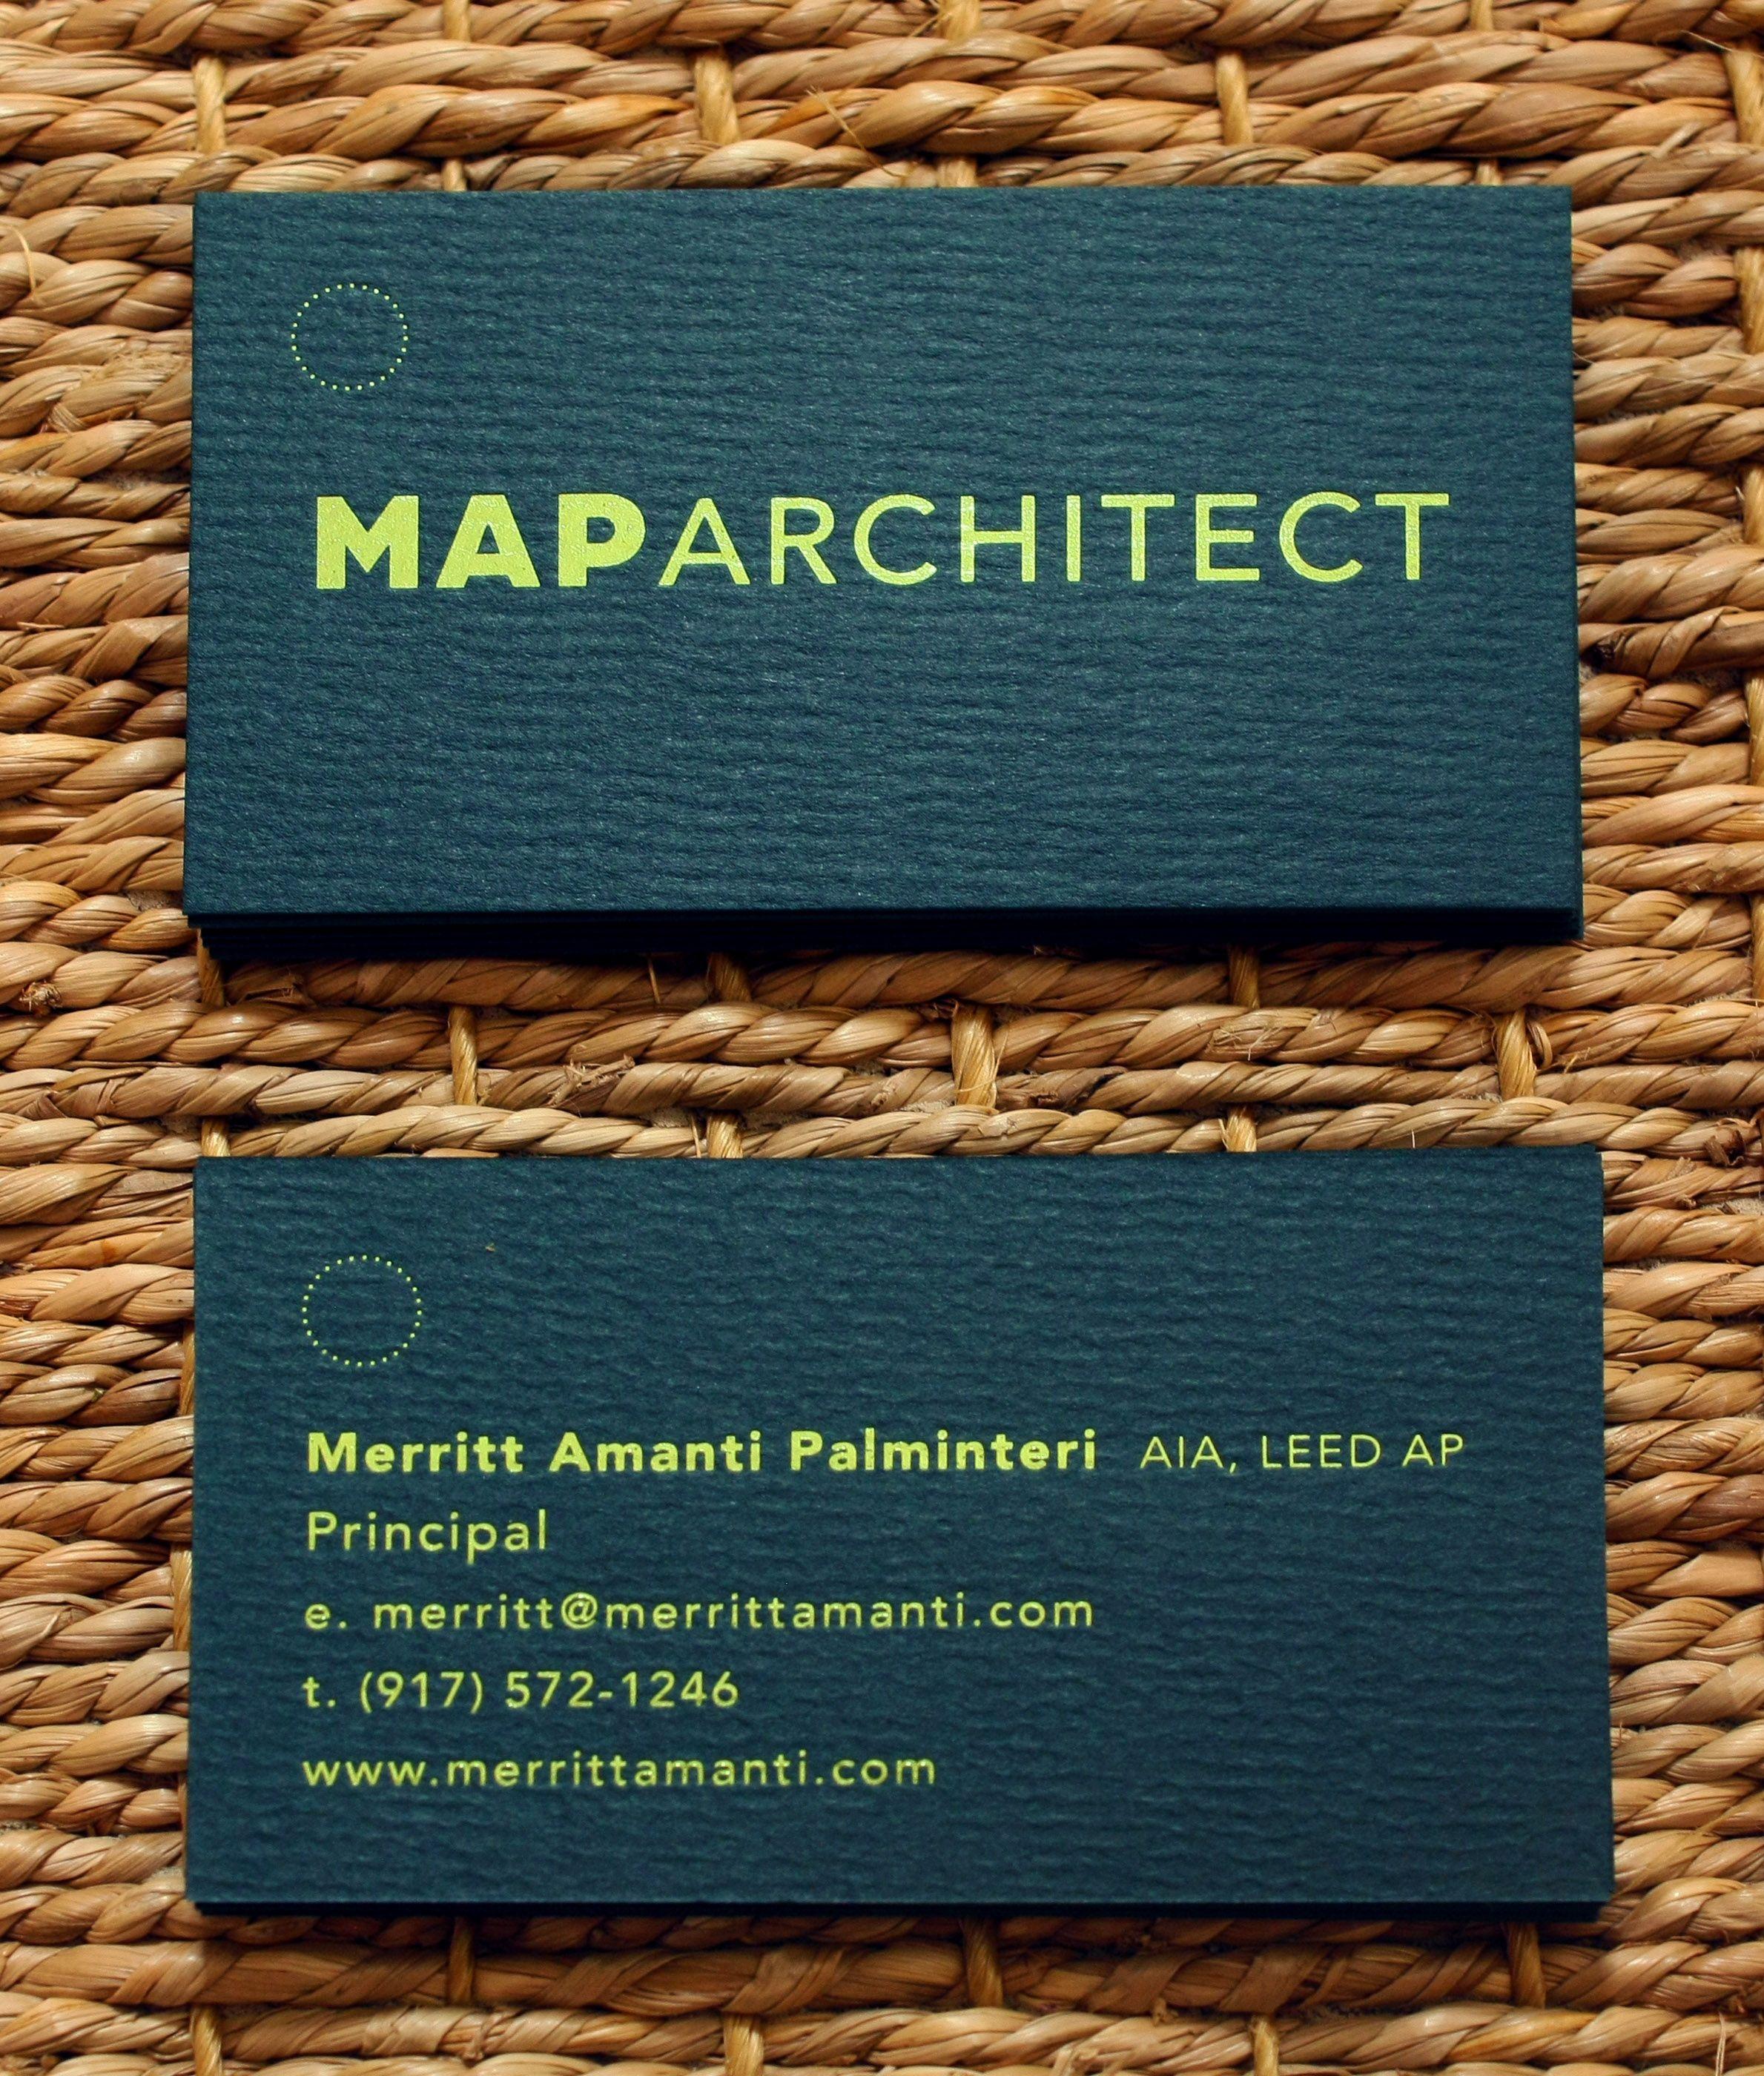 Letterpress business cards neon metallic eggshell with romalian letterpress business cards neon metallic reheart Choice Image